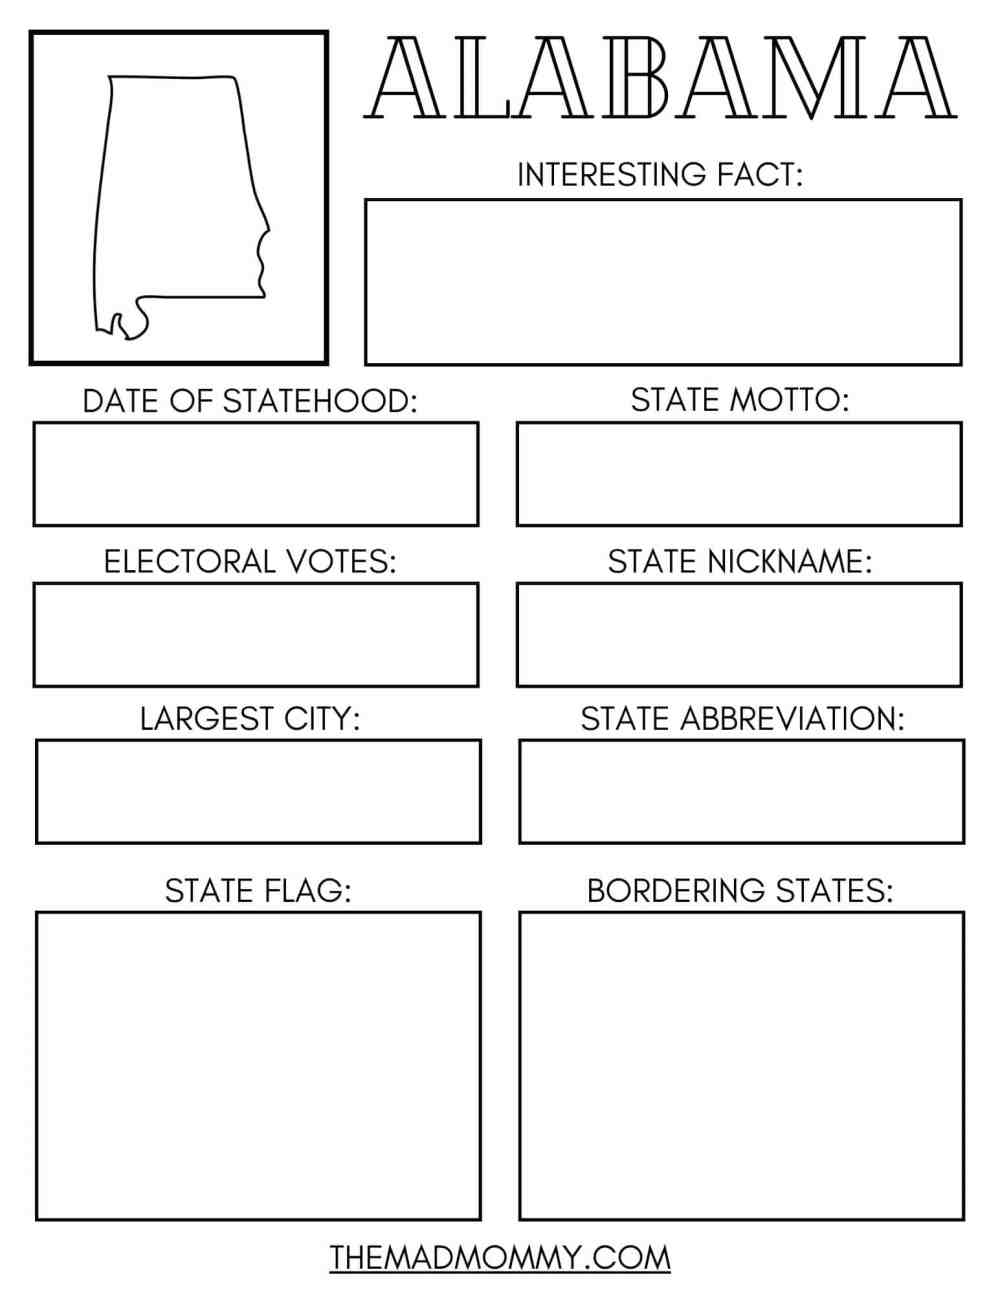 medium resolution of 15 Facts About Alabama + Free Printable State Workbook - Sadie Smiley -